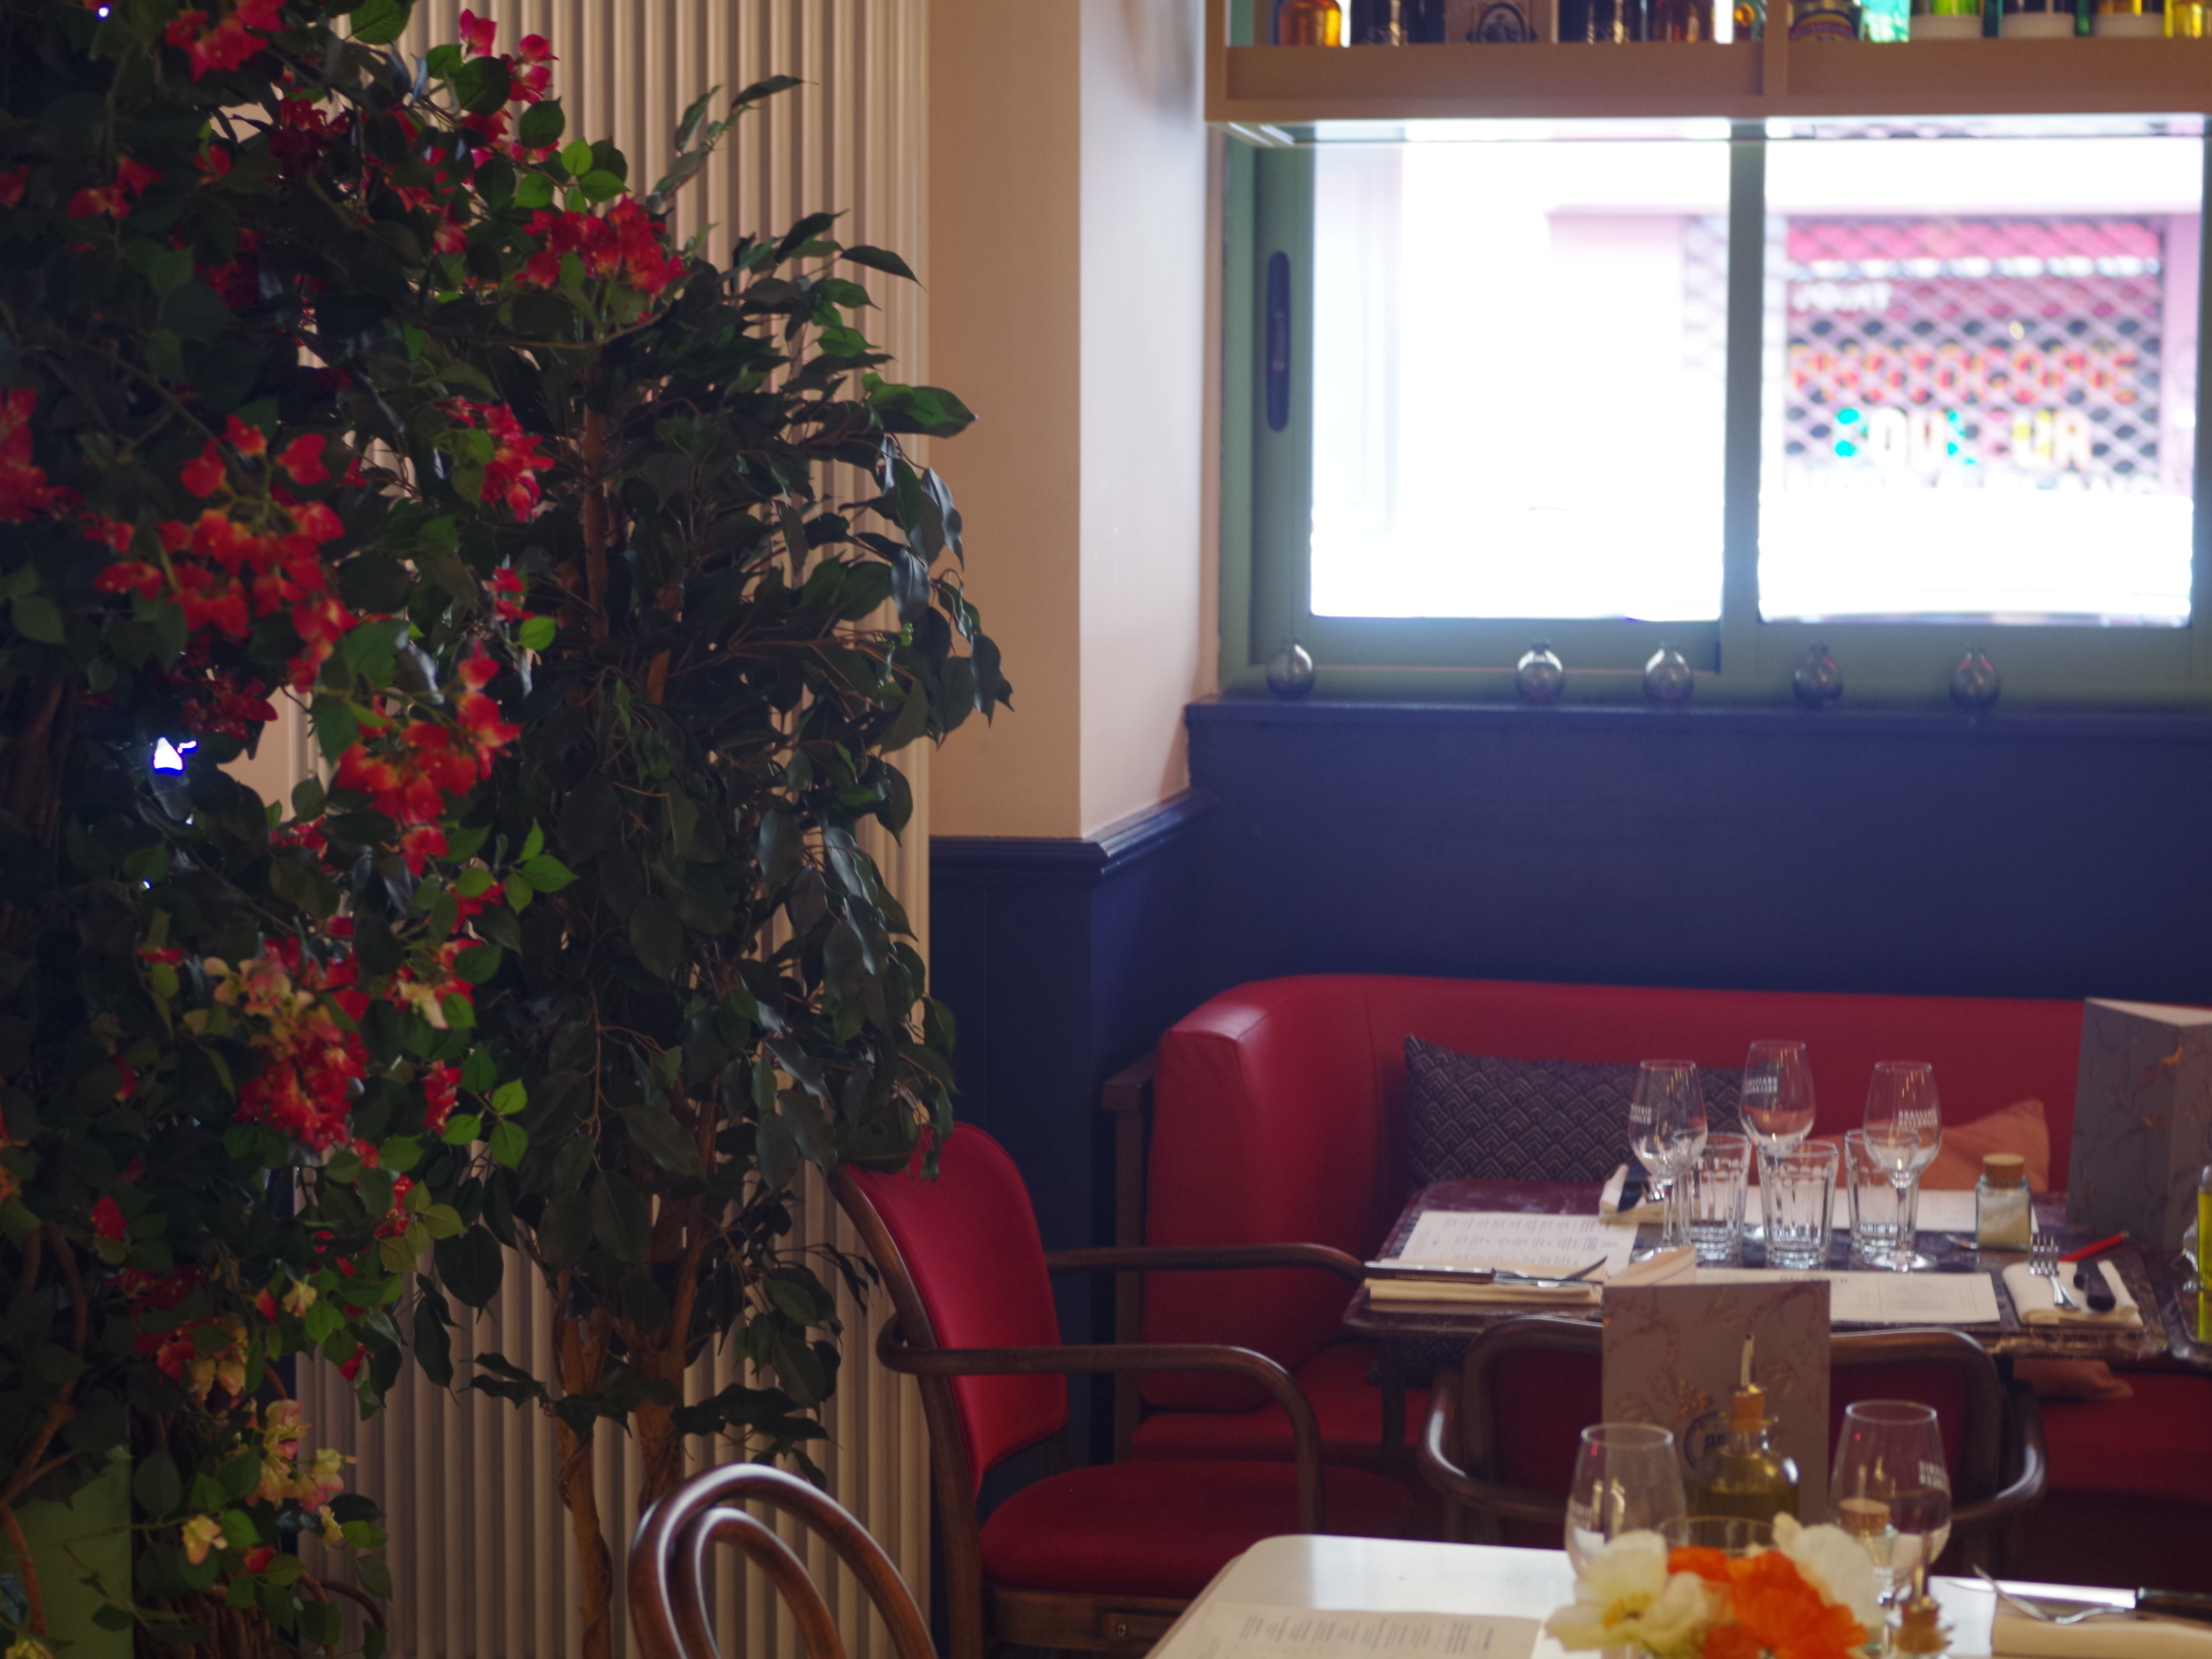 brasseries bellanger inside paris 2